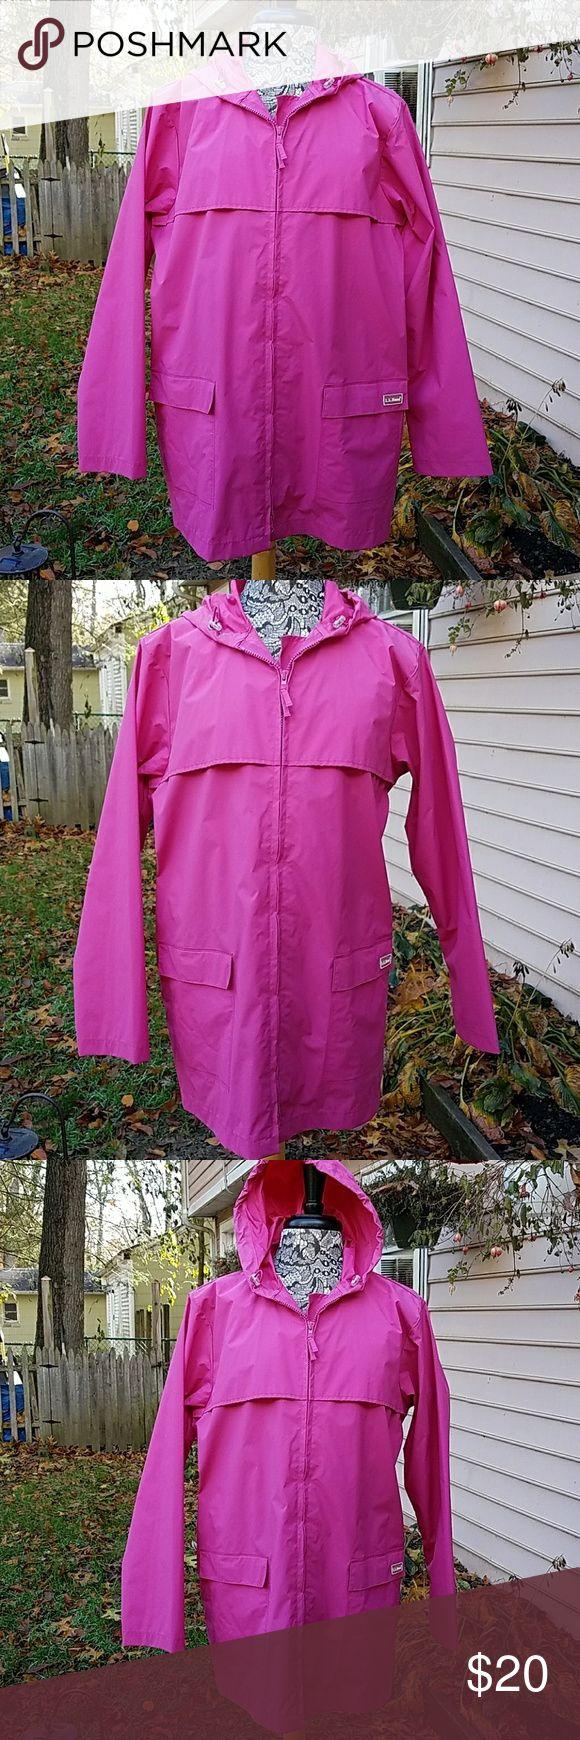 L.L. Bean Woman Rain Jacket L.L. Bean Woman Rain Jacket pink size L Zip front two pockets with velcro closure.  Vented back with drawstring hood.  Shell 70% P.V.C  backing 30% nylon.  Style 0NX08 PVC L.L. Bean Jackets & Coats